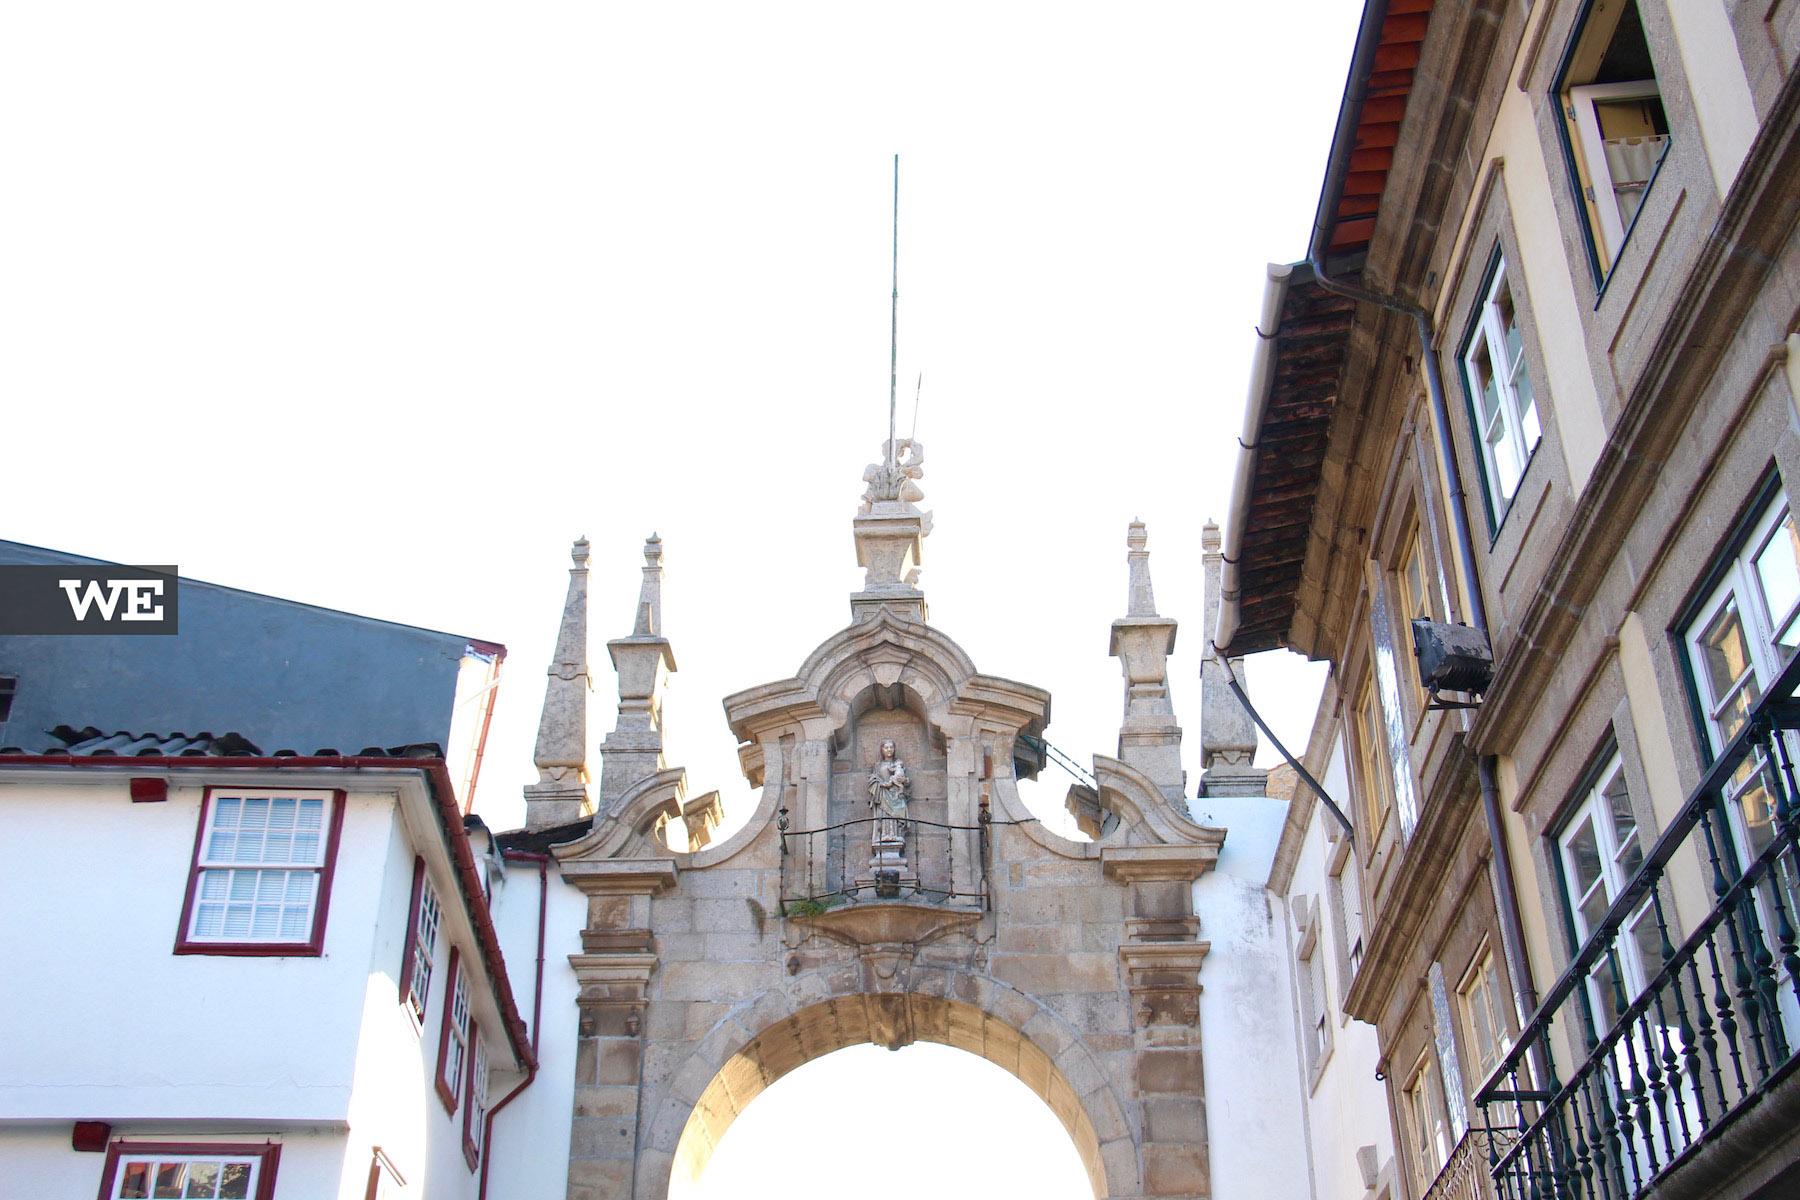 we-braga-arco-porta-nova-12